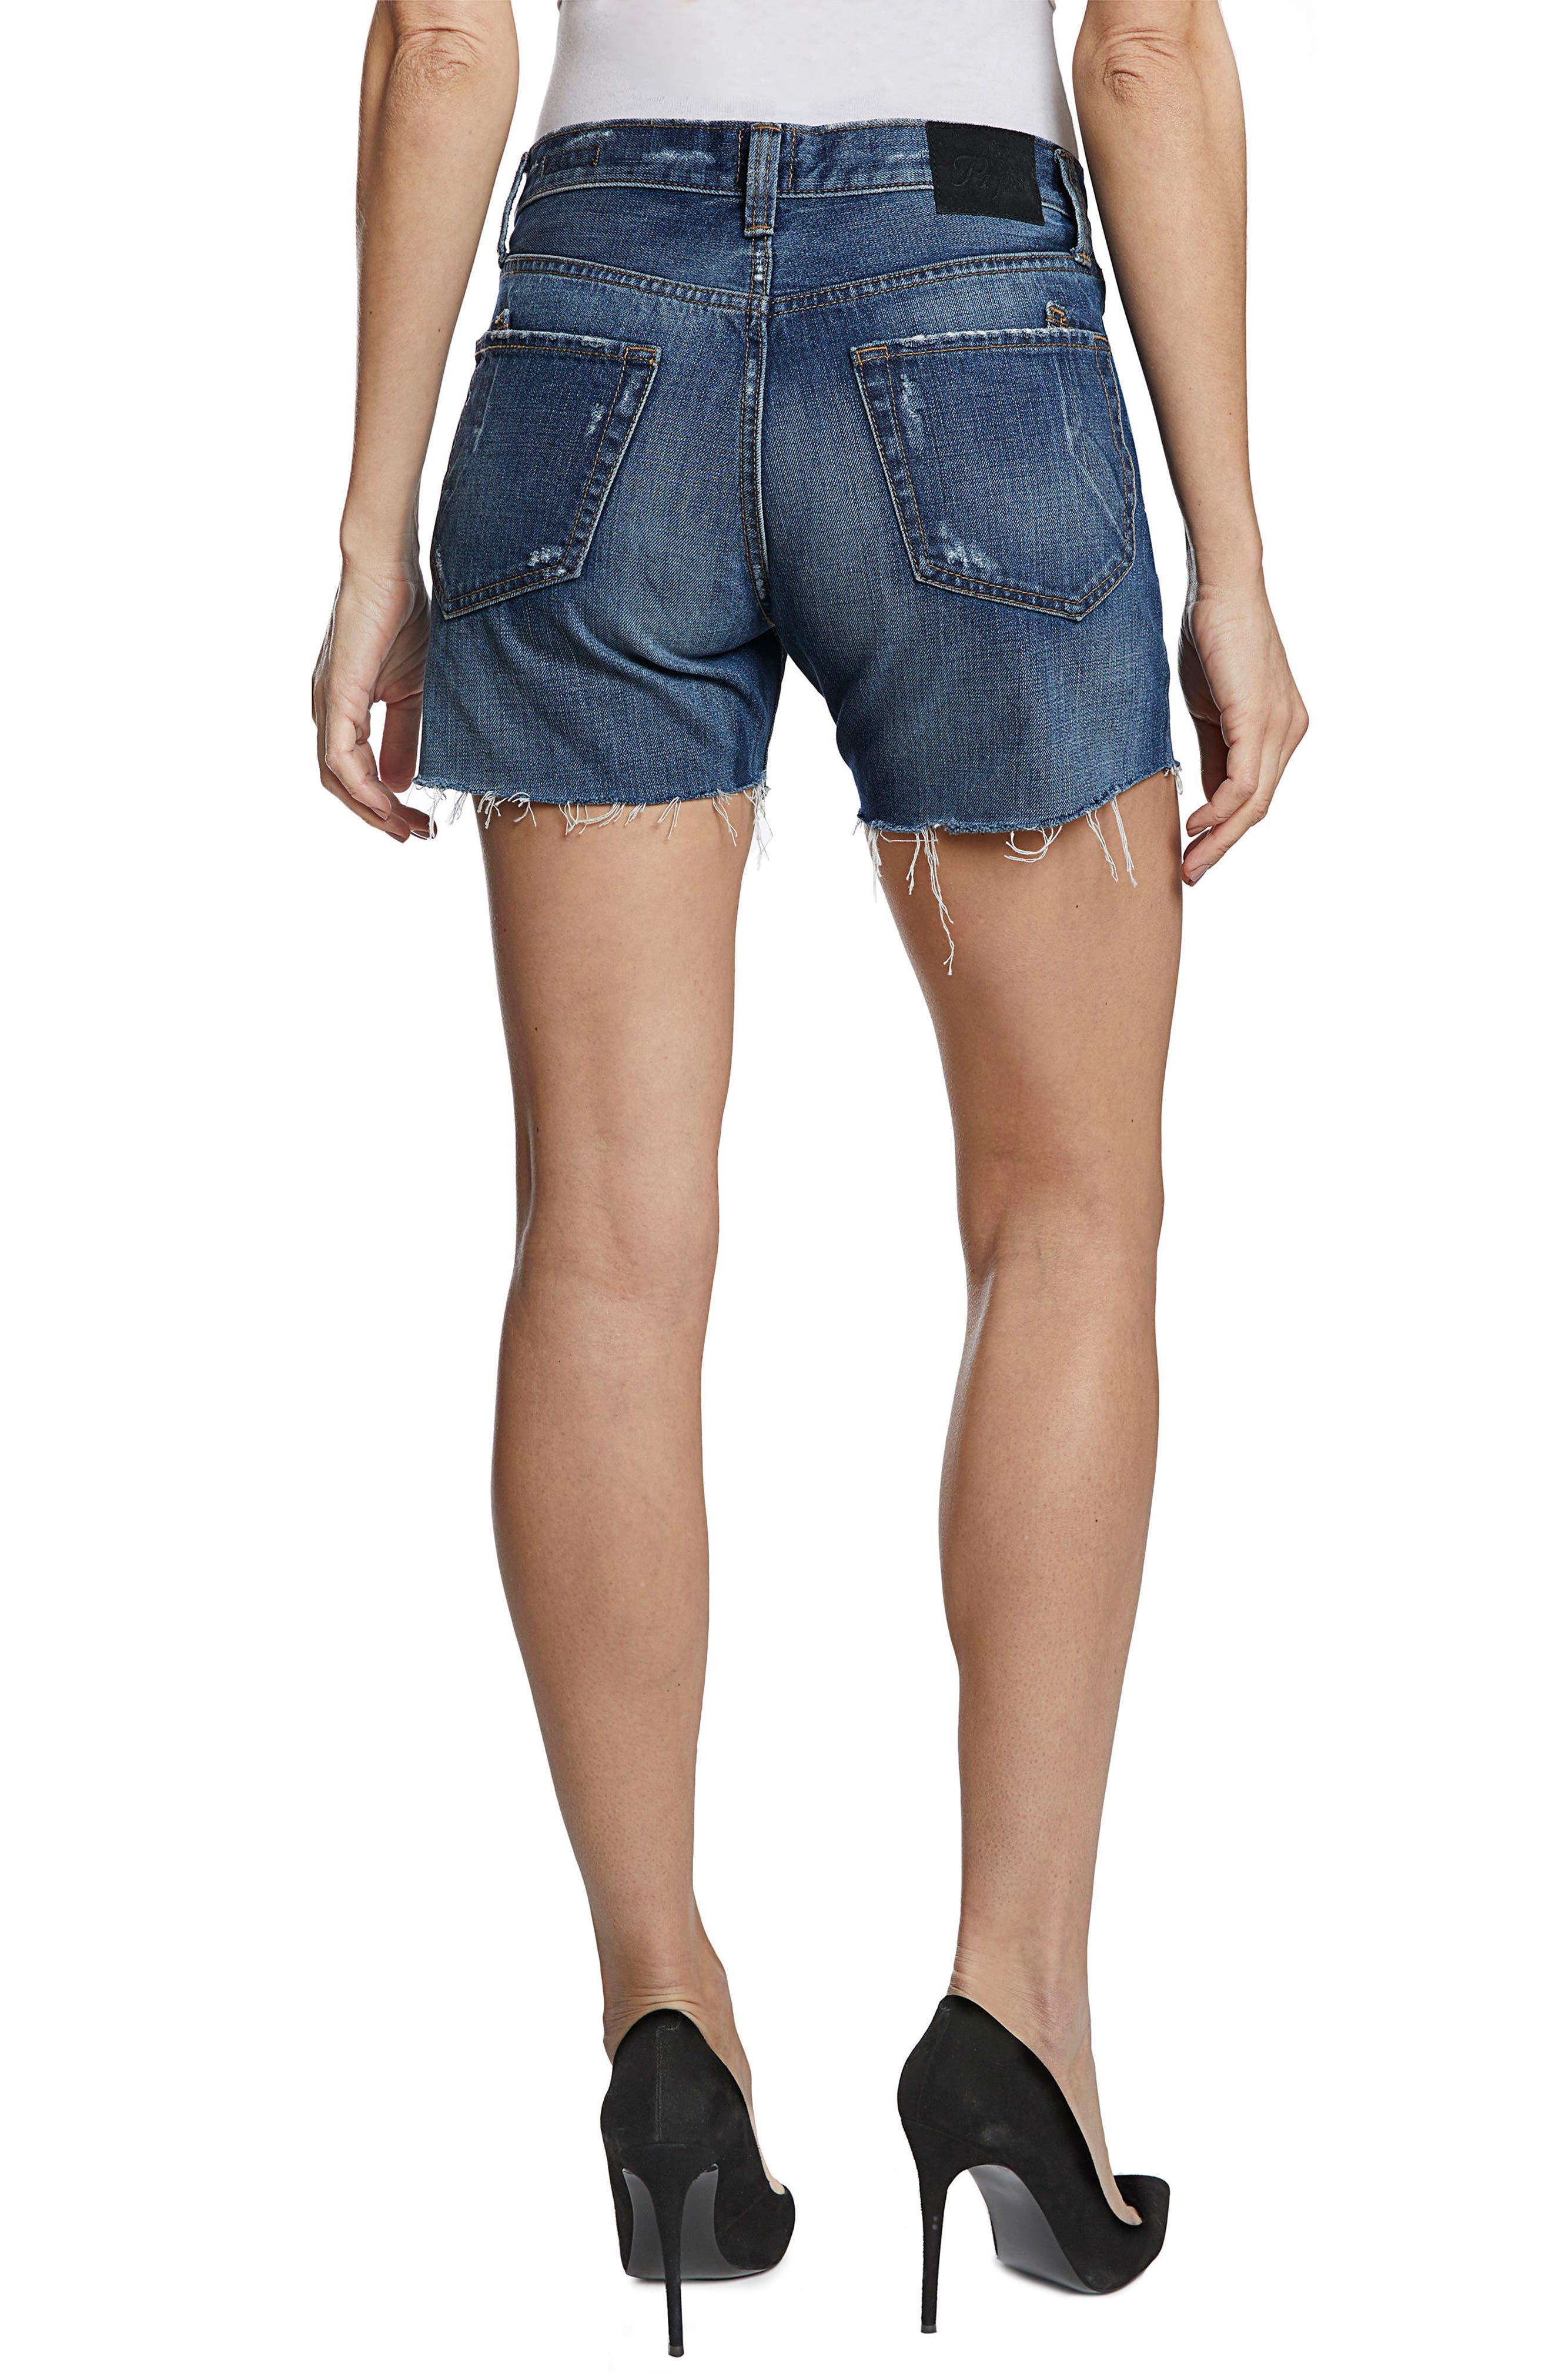 El Camino Cutoff Denim Boyfriend Shorts,                             Alternate thumbnail 2, color,                             Medium Wash